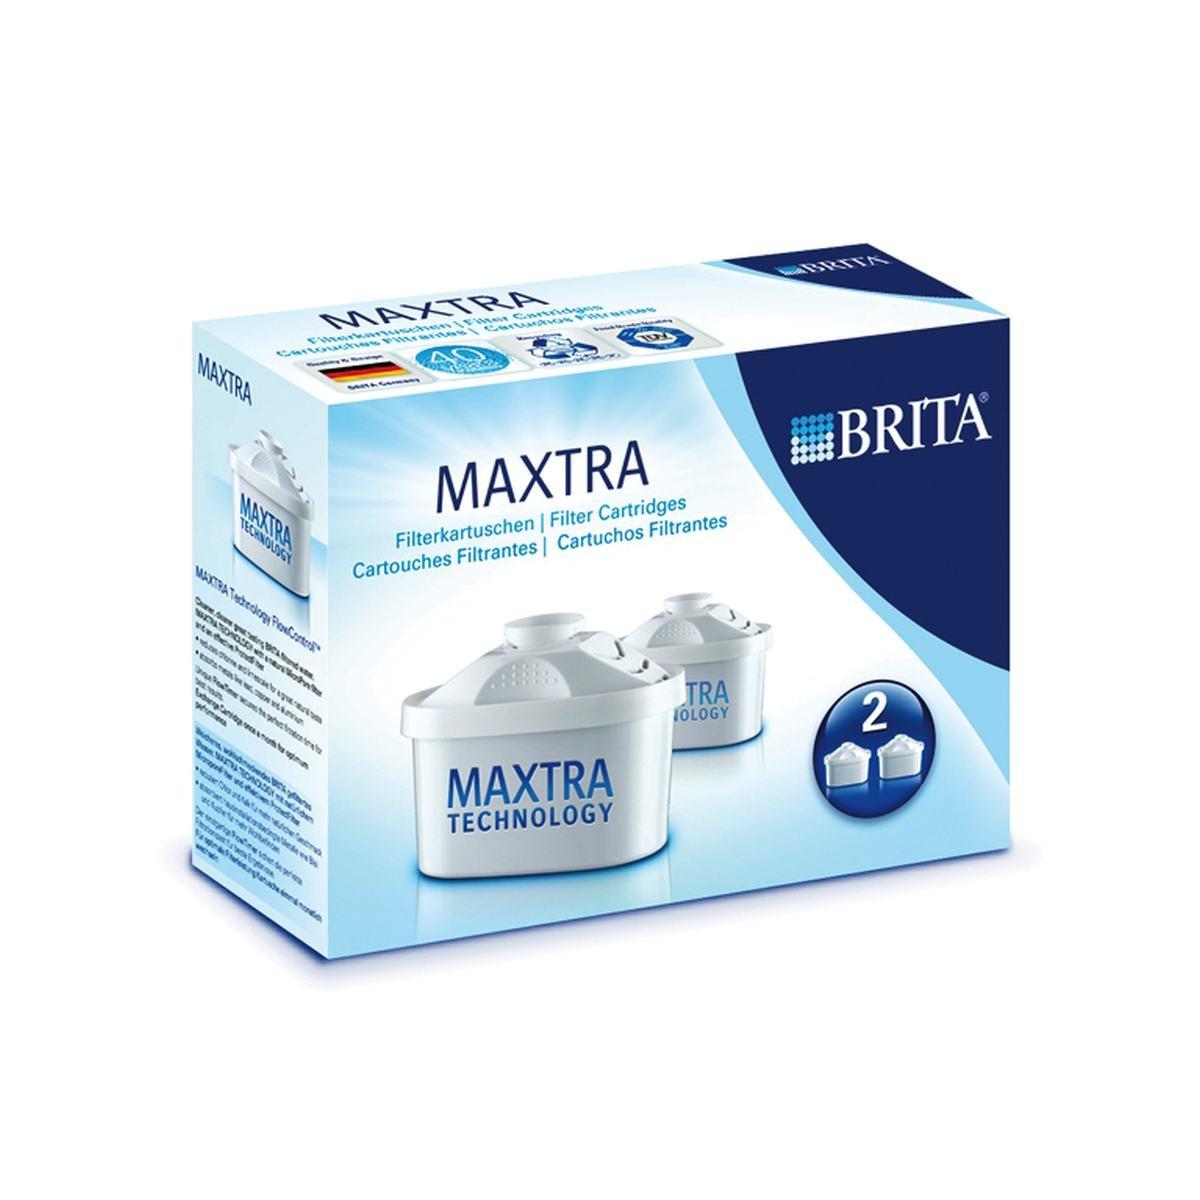 Vannfilterpatron Brita Maxtra 2 stk. pk. -